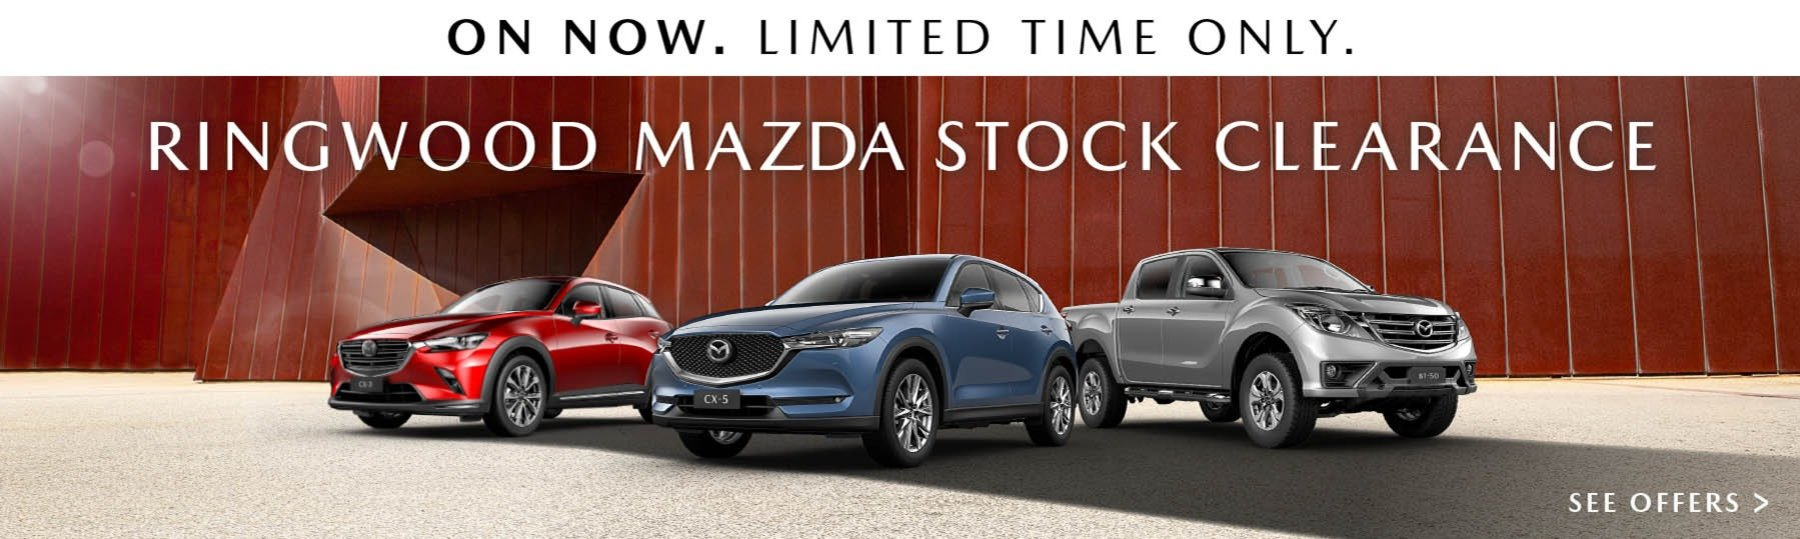 Ringwood Mazda Stock Clearance